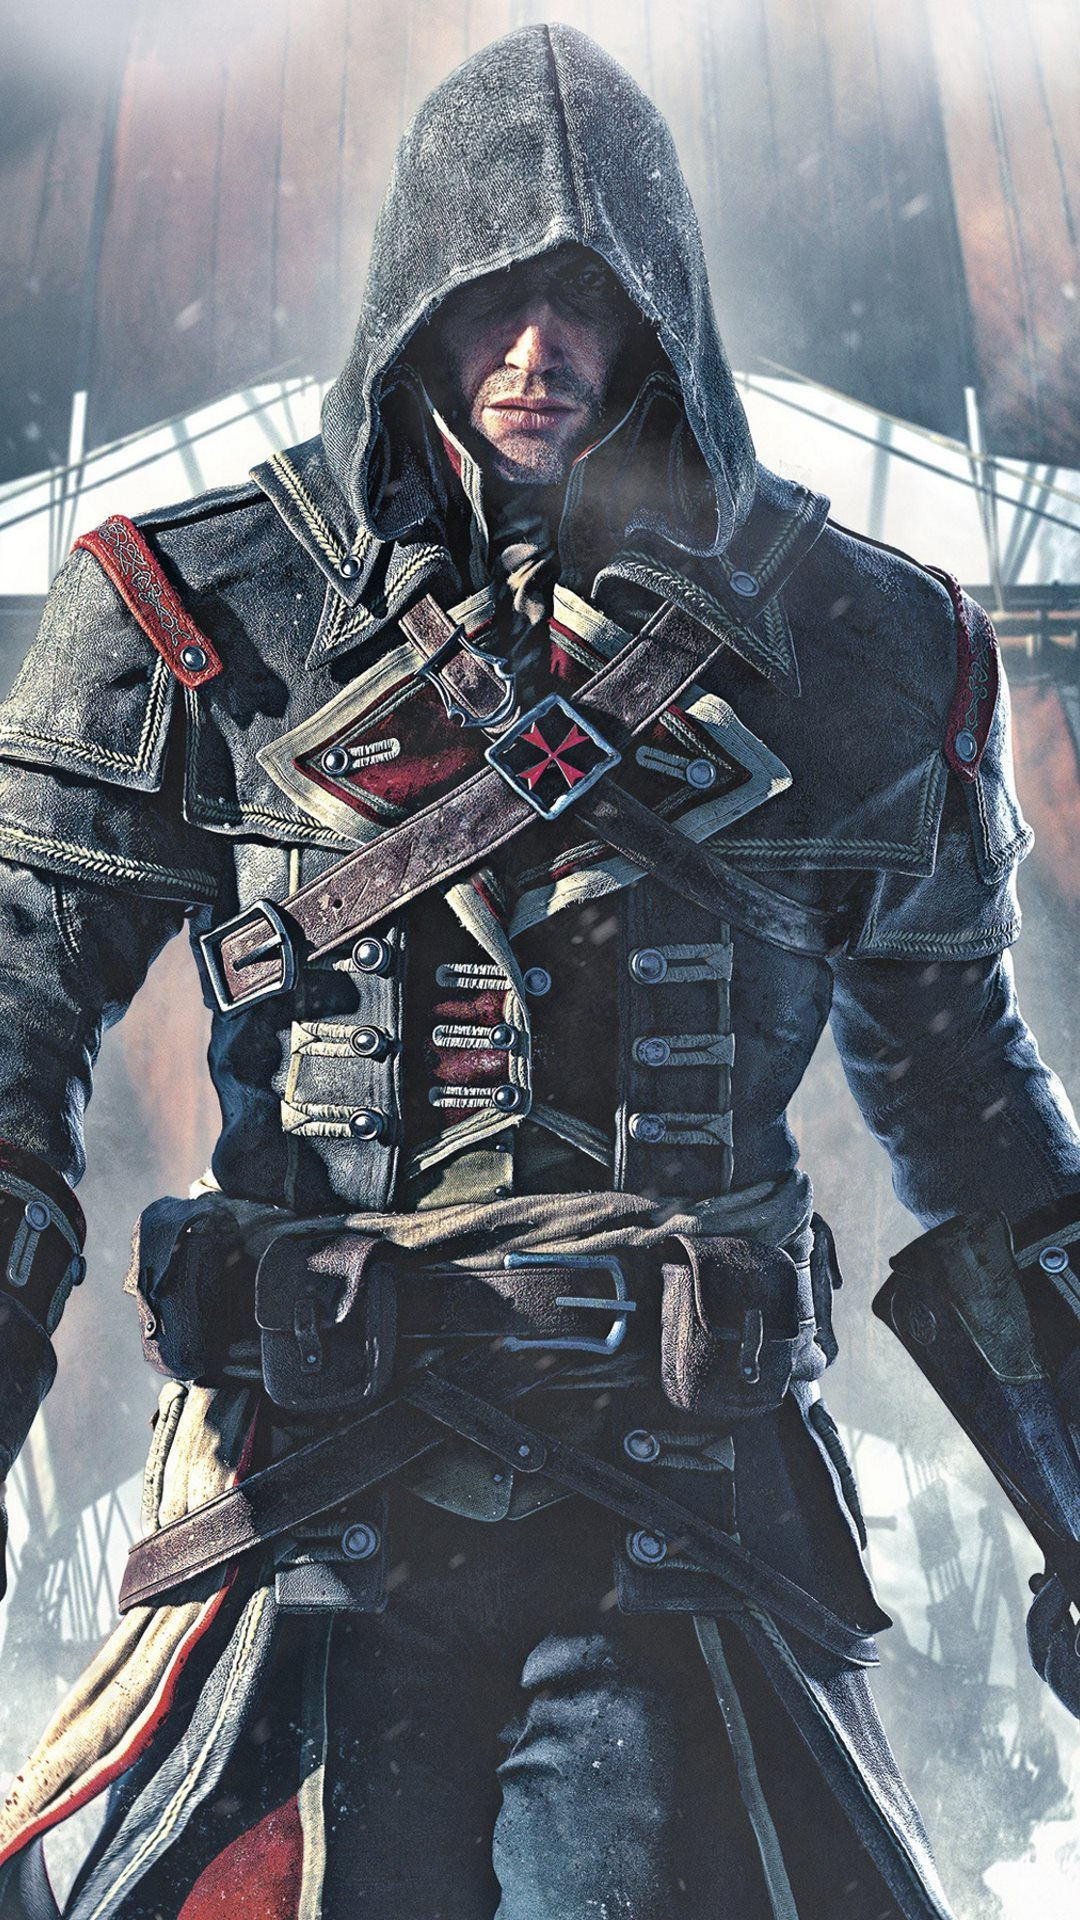 Assassin S Creed Rogue Wallpaper Assassins Creed Rogue Assassin S Creed Assassin S Creed Wallpaper